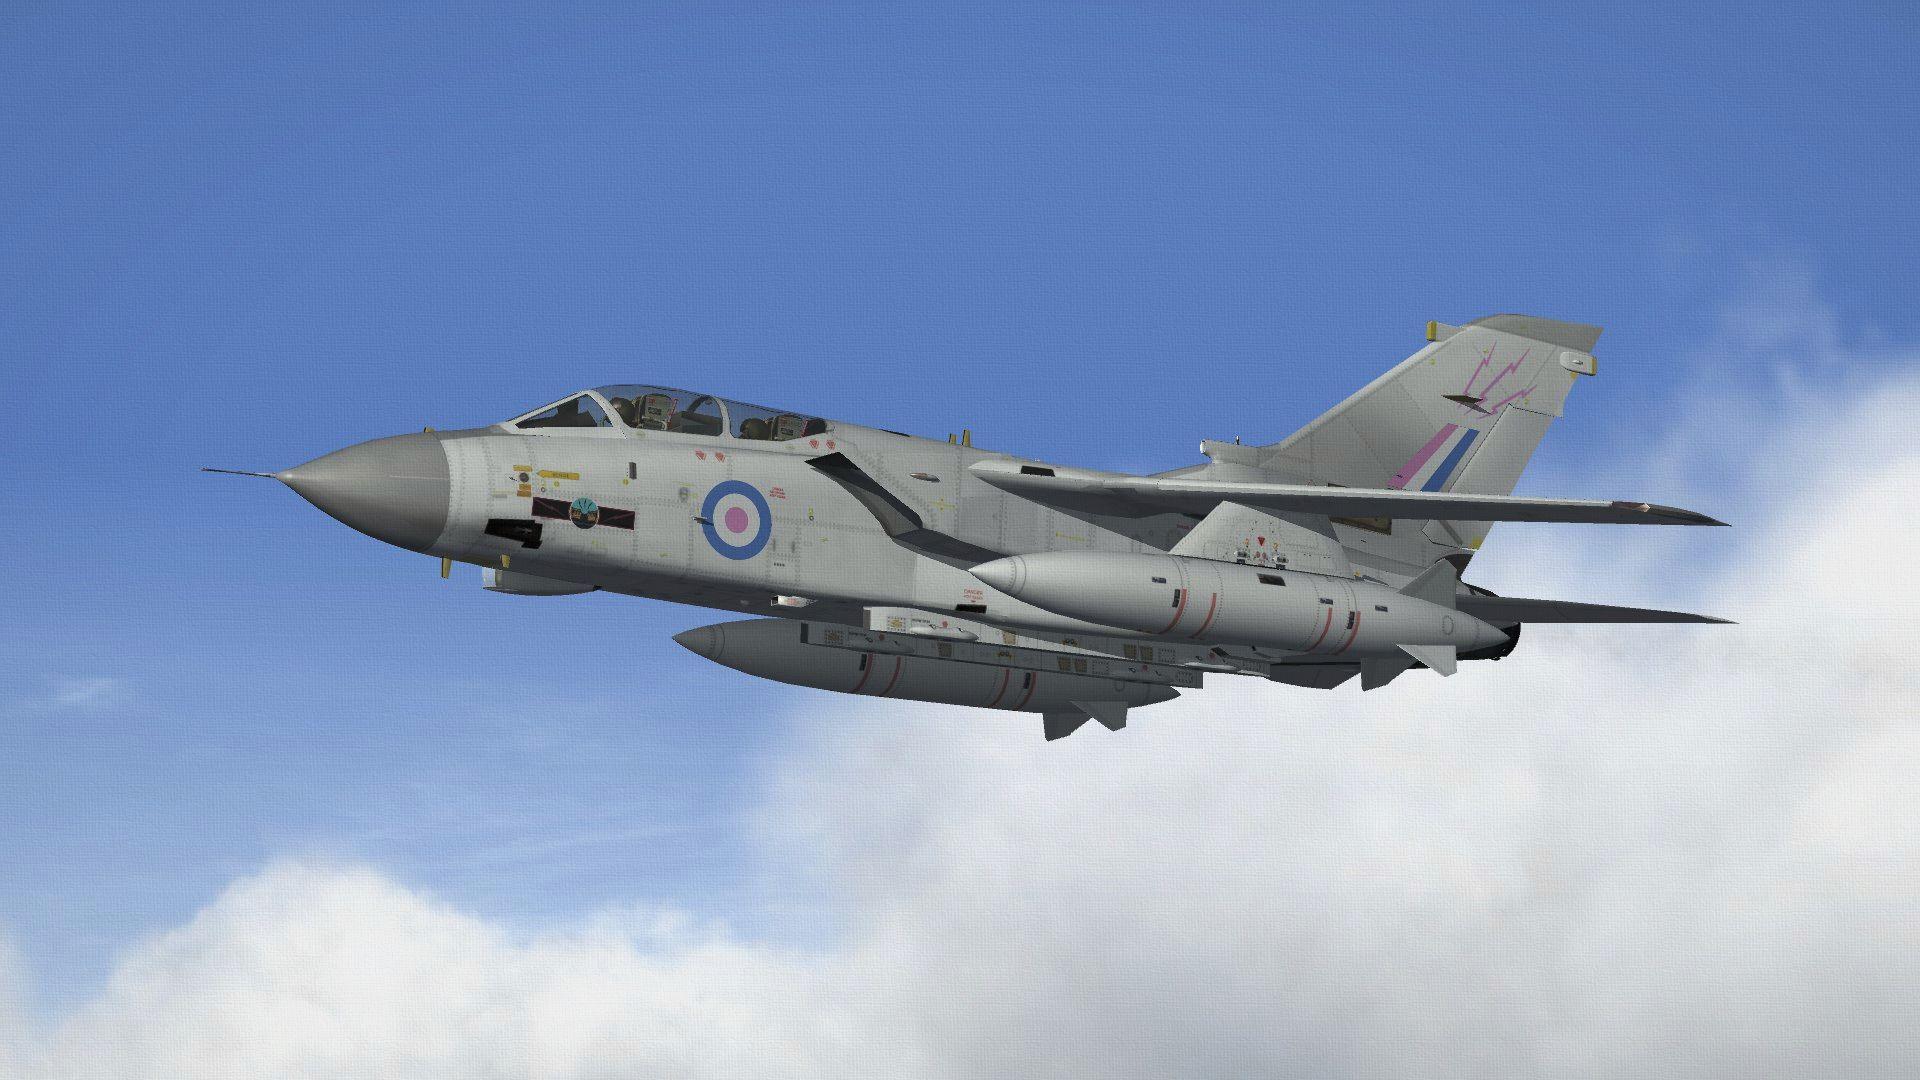 RAF%20TORNADO%20S1.01_zpsvffhthcx.jpg